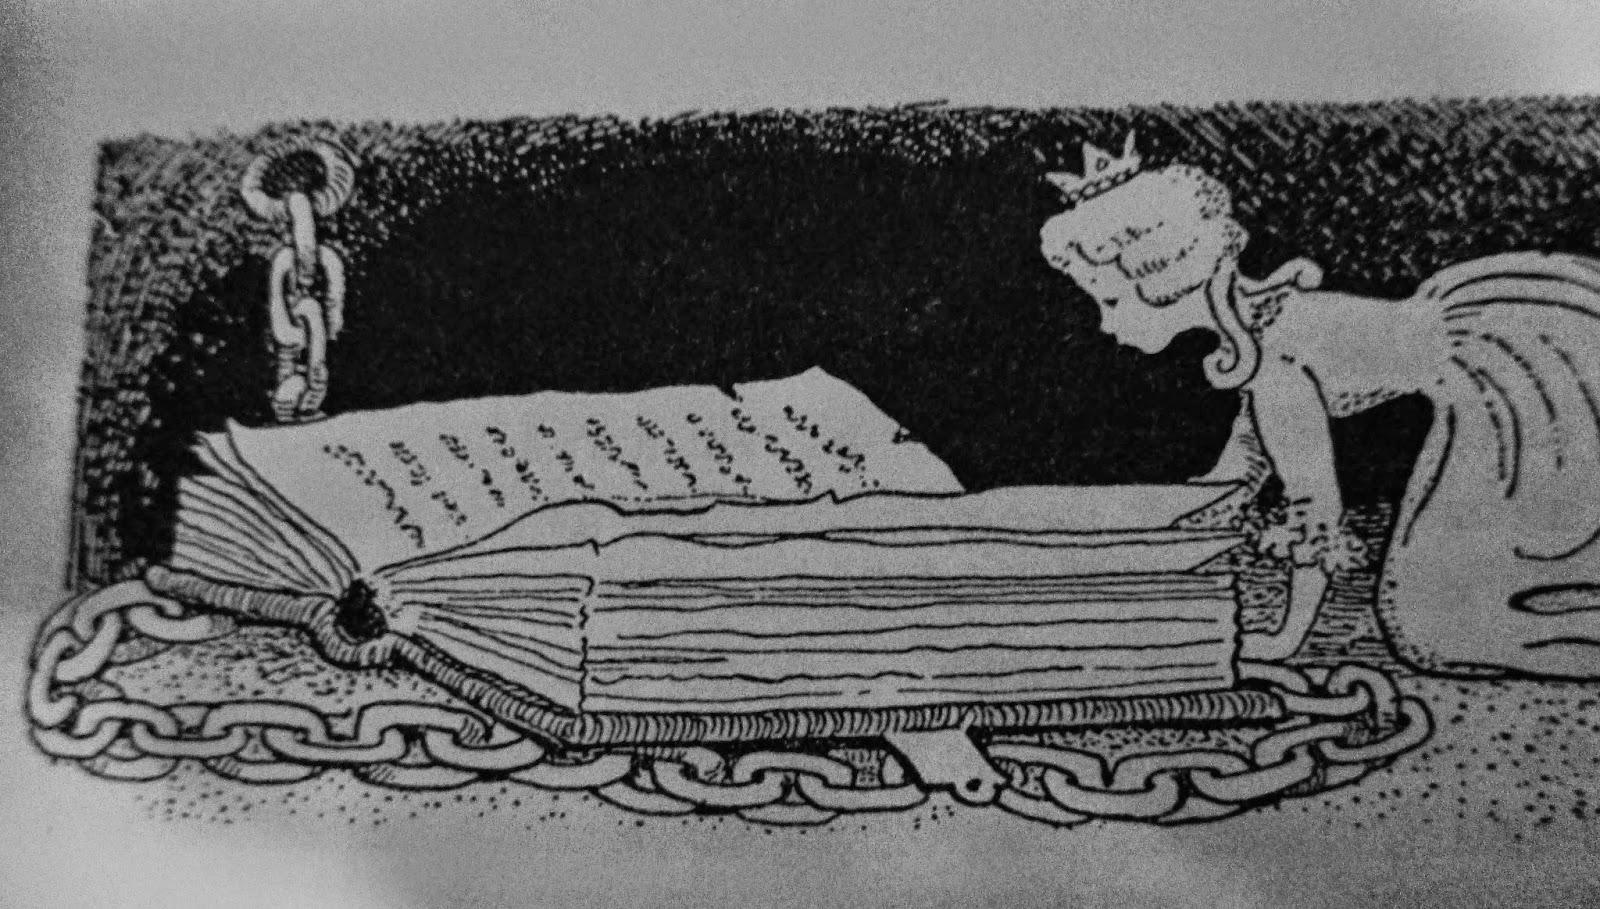 Irjan kirja, Beskow, prinsessa, kirja